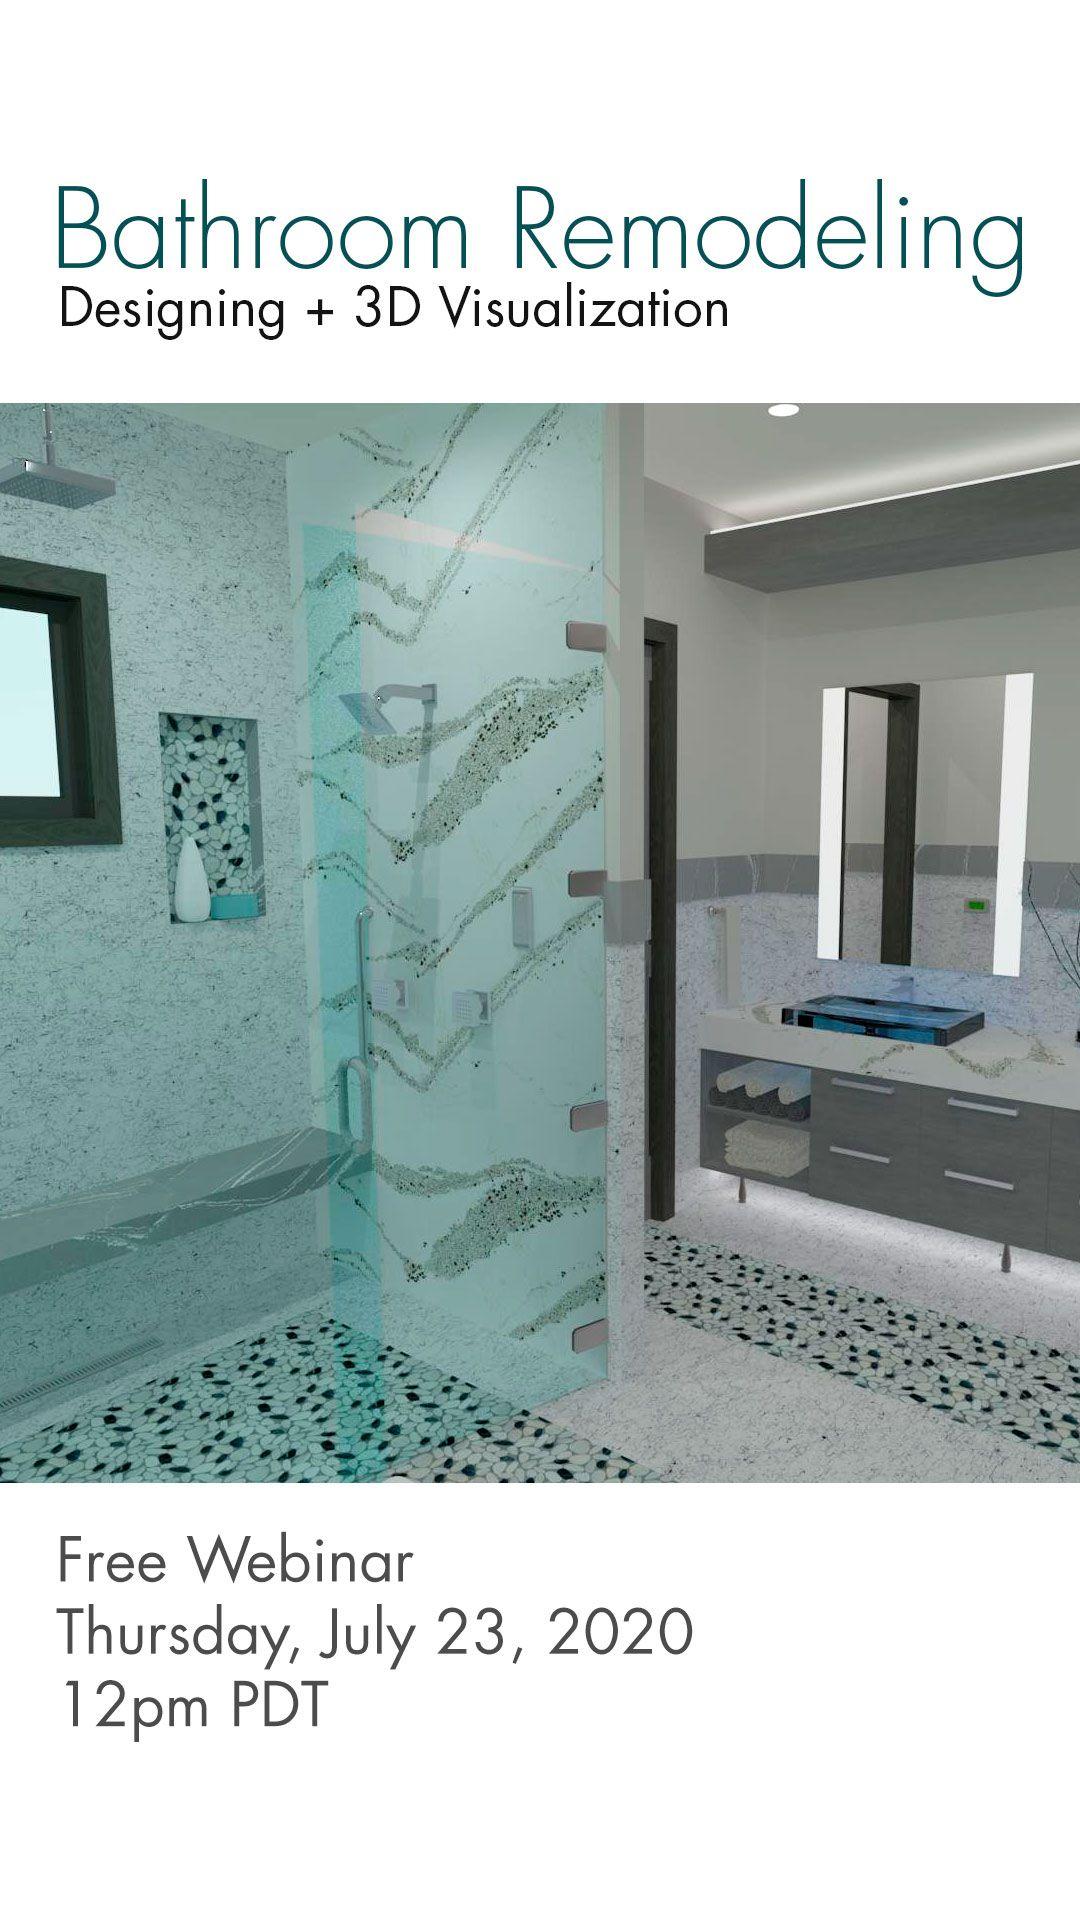 Bathroom Remodel in 2020 | Remodeling software, Architect ...